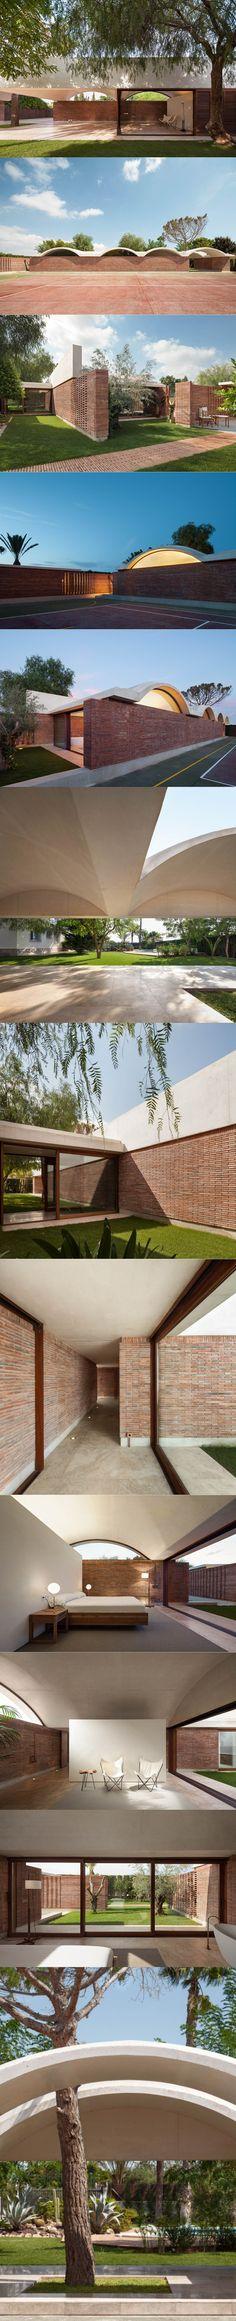 2012-2015 Mesura - 1208 Casa IV House Extension / Elche Spain / brick concrete